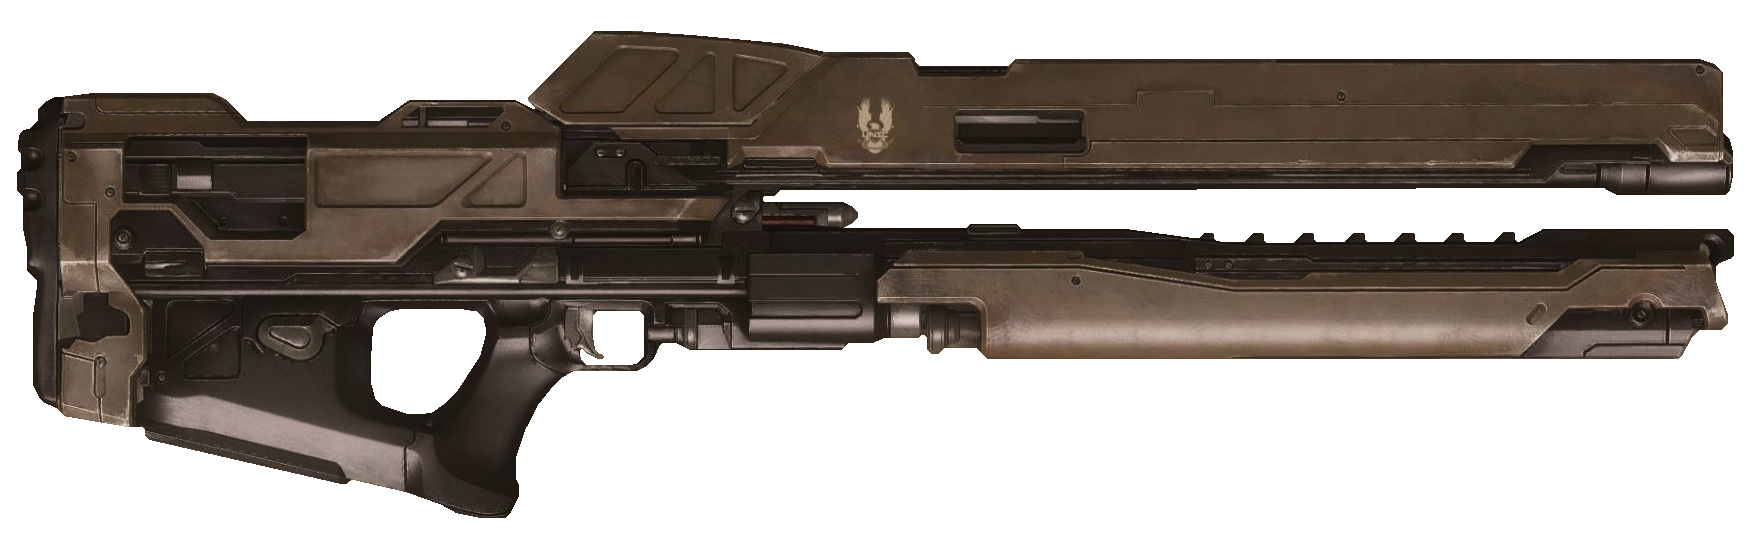 M921 Asymmetric Recoilless Carbine